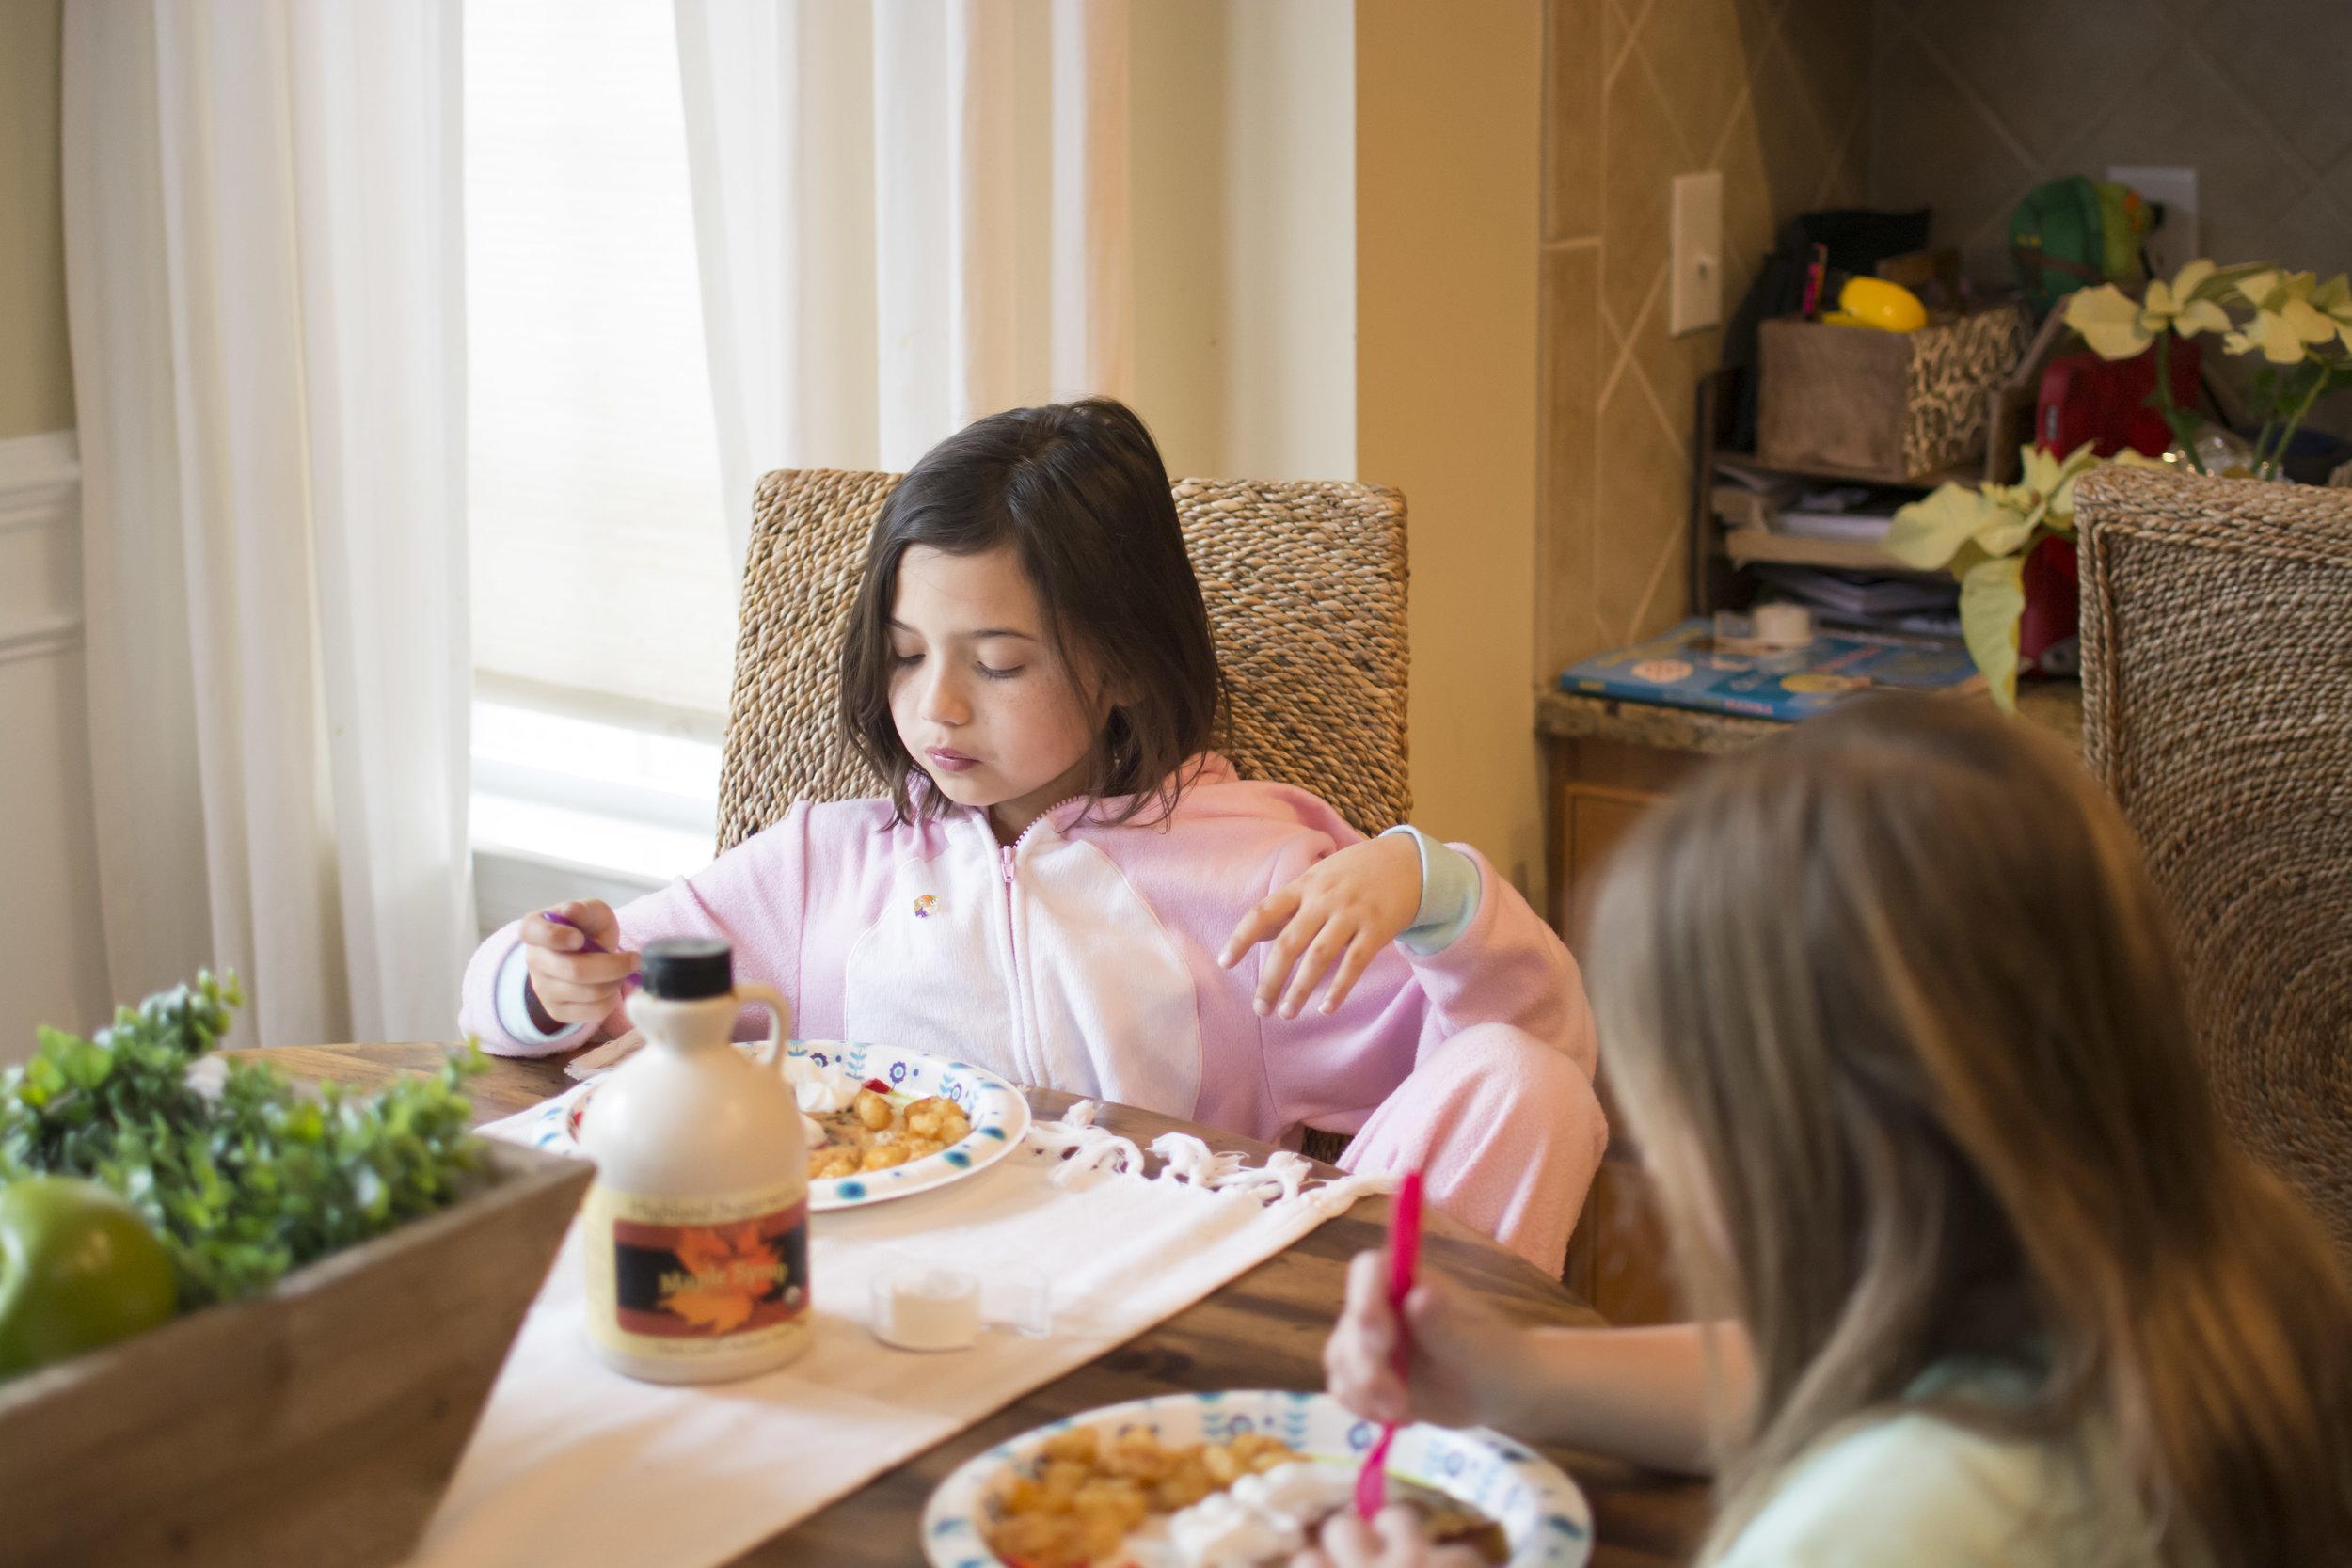 fort mill, sc family photographer  birthday confetti pancakes, breakfast